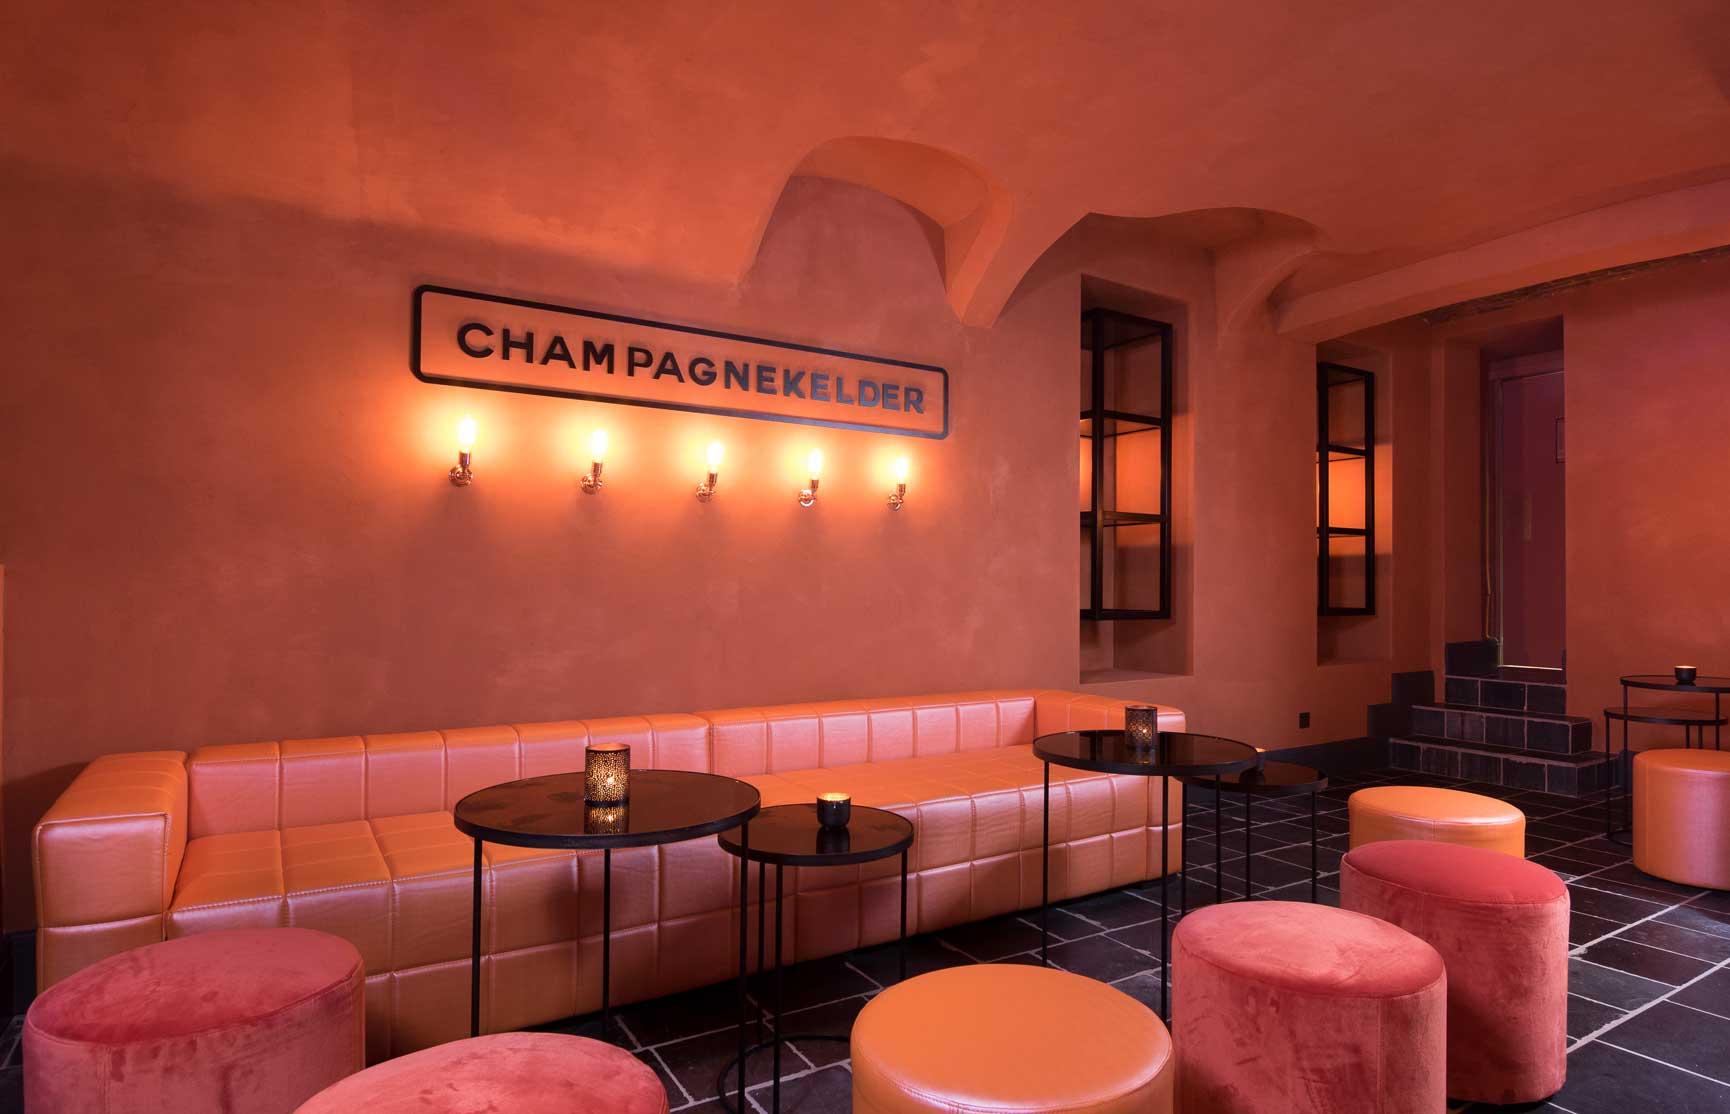 Champagnekelder-2.jpg